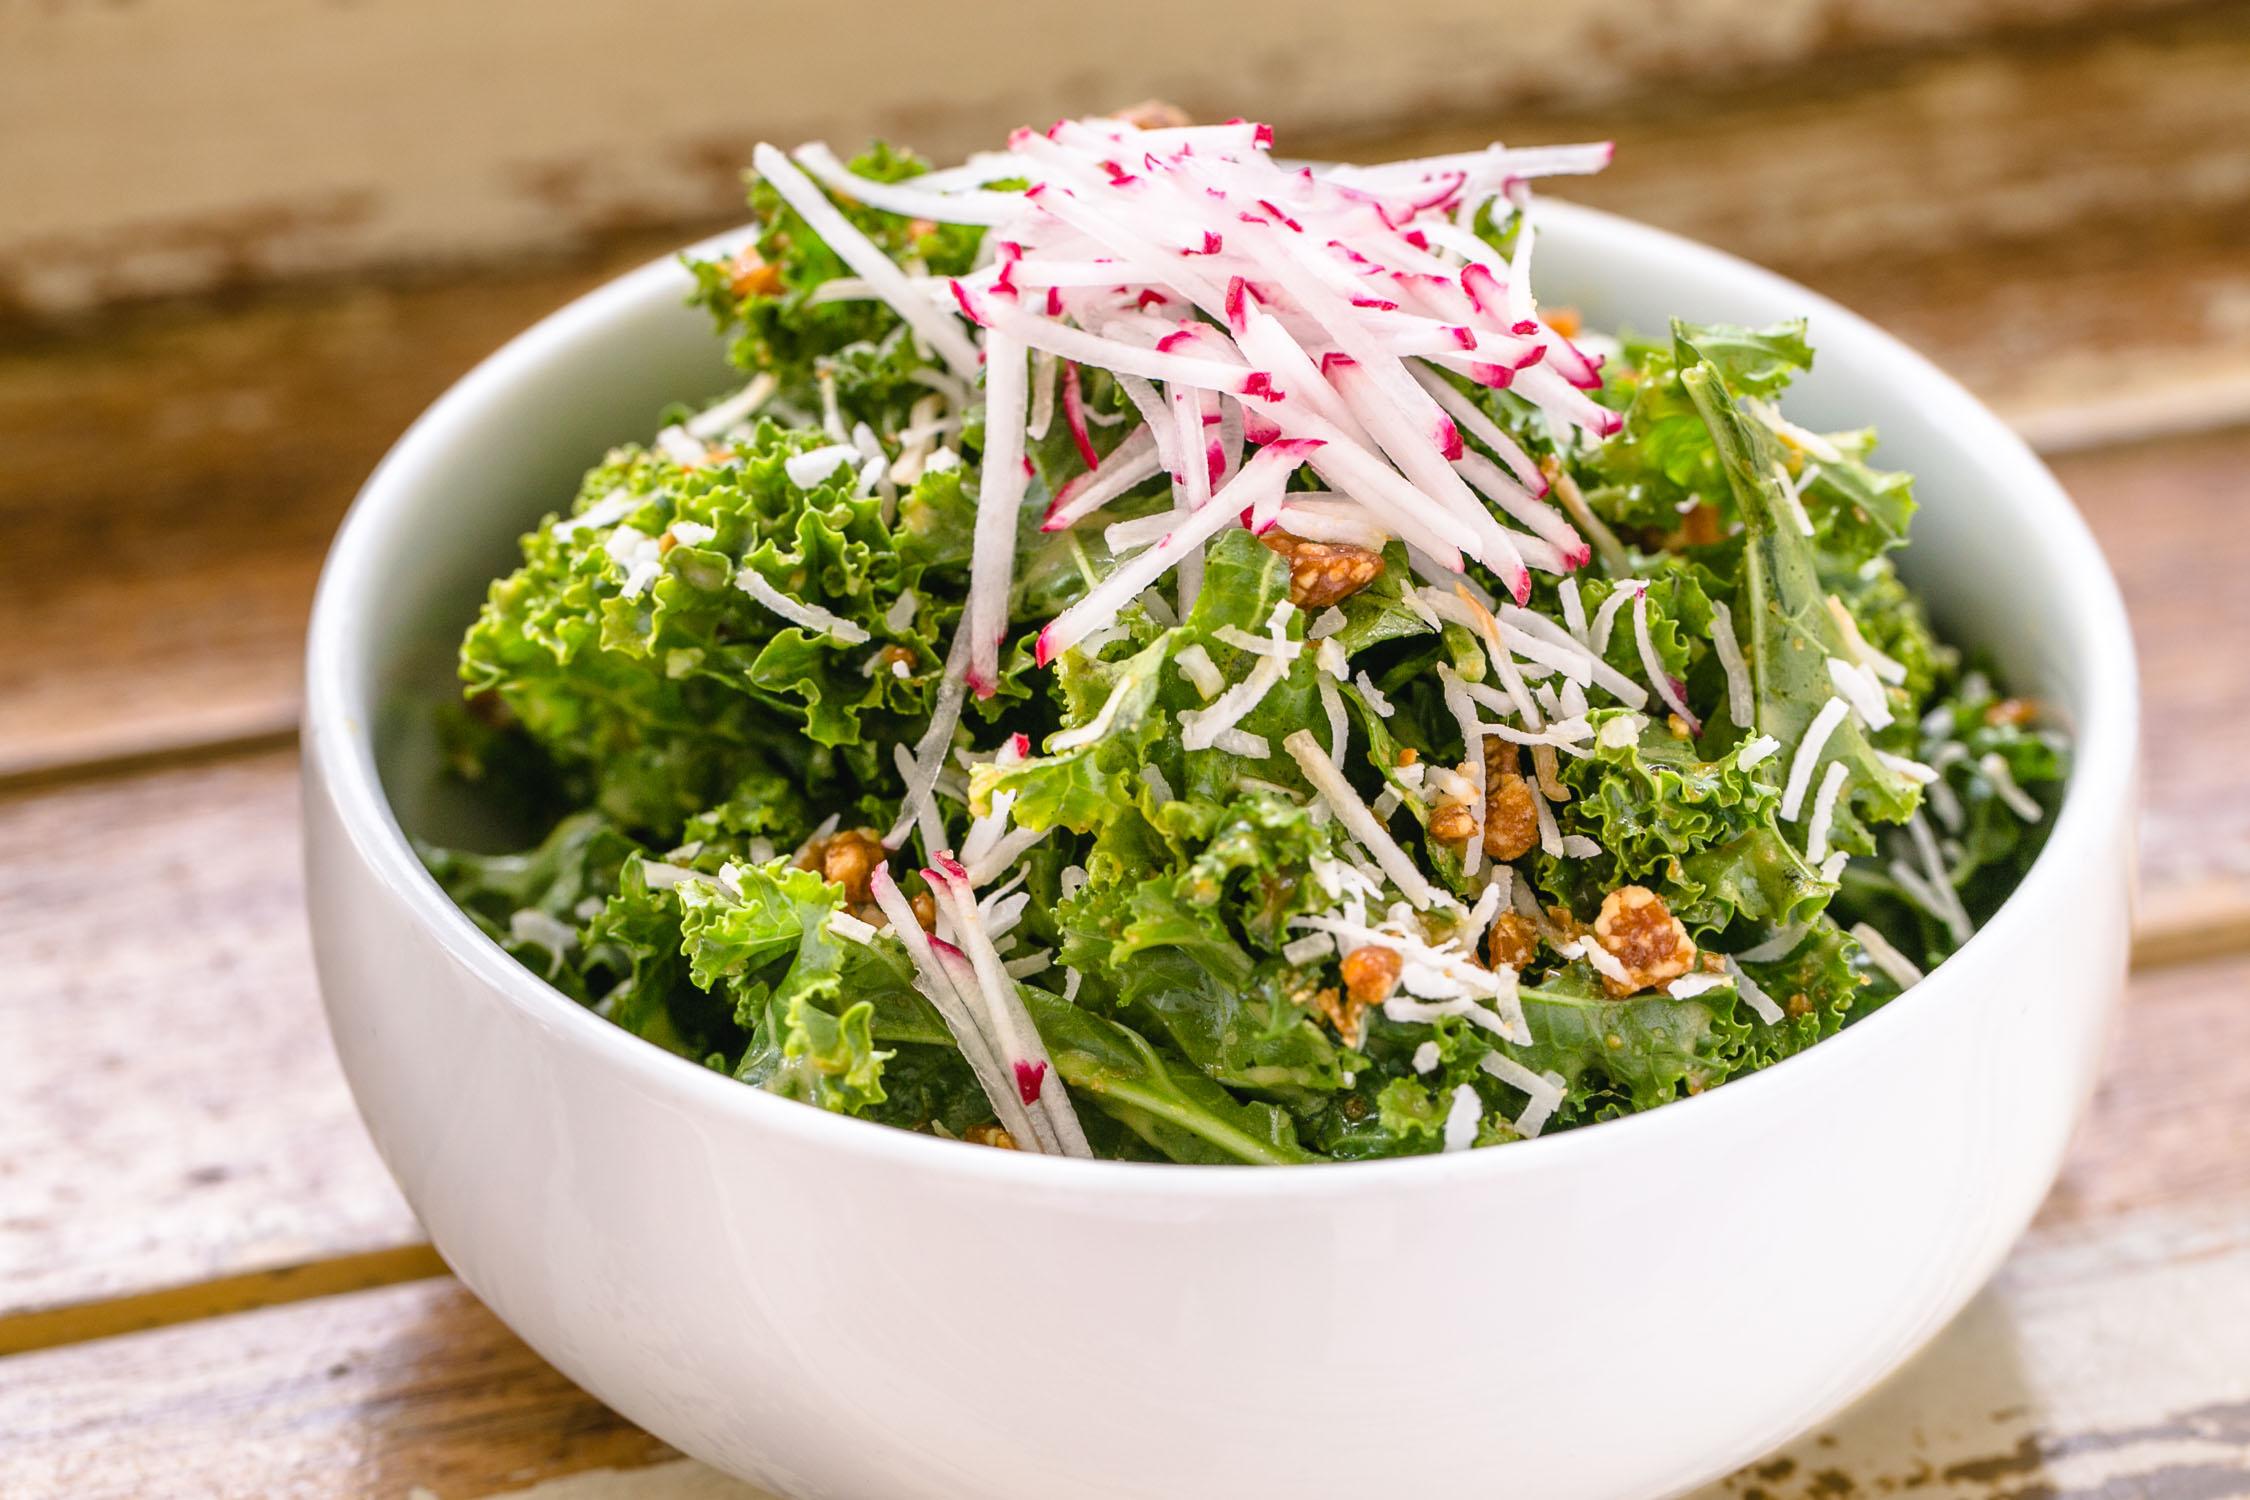 Le-Fat-Kake-Salad-Erik-Meadows